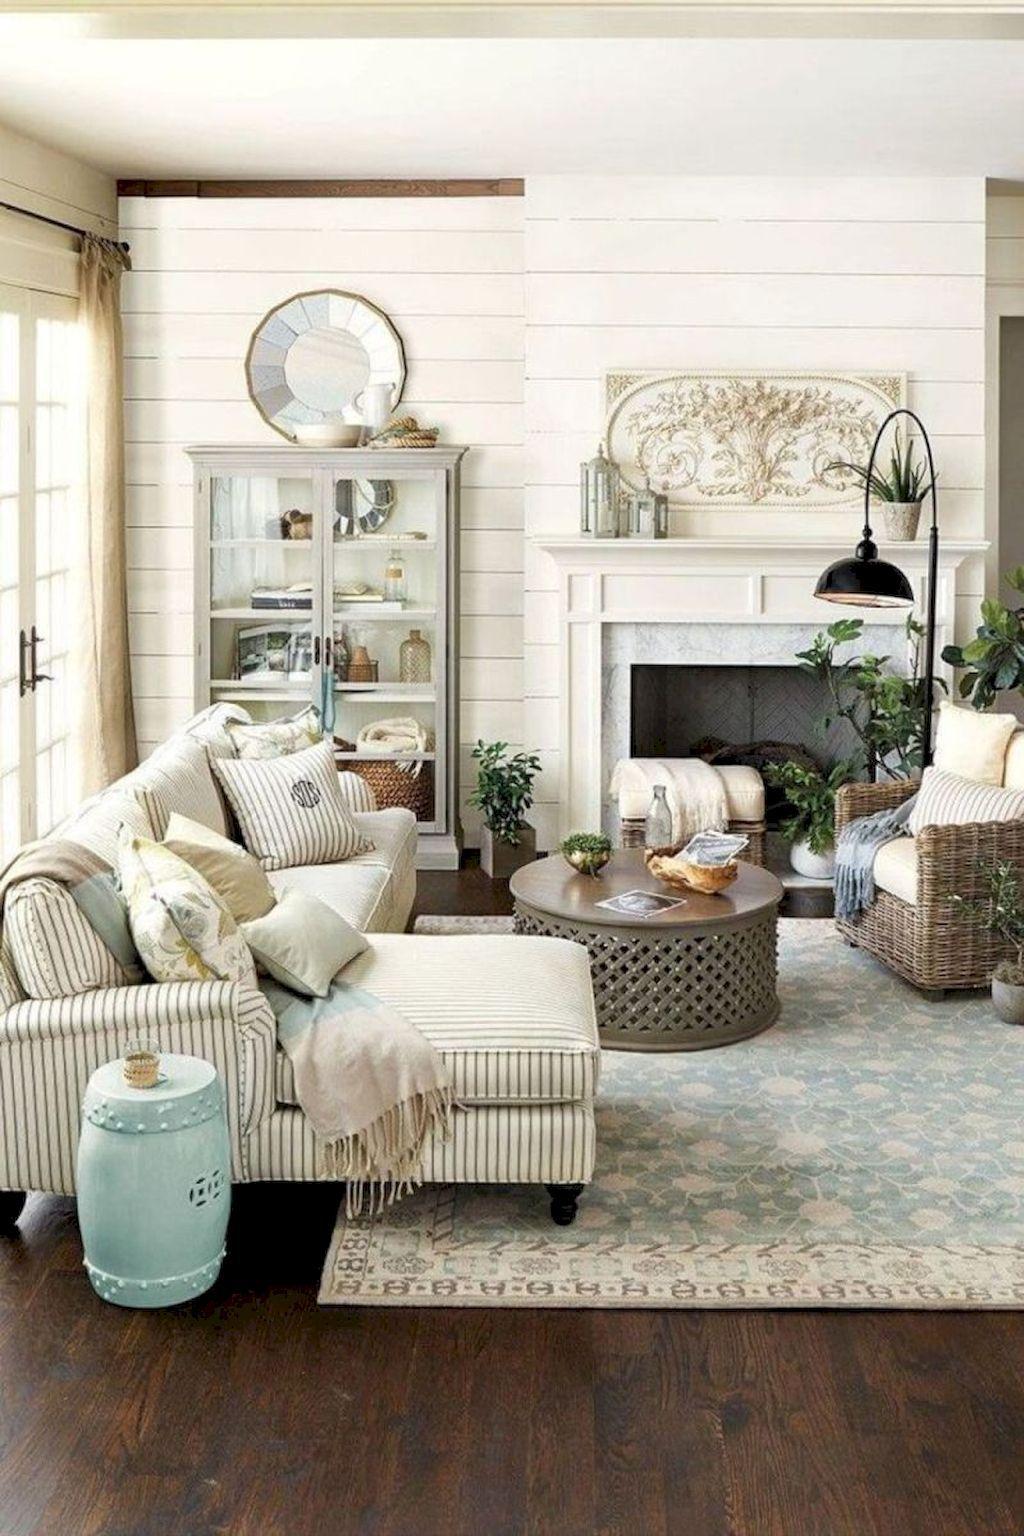 Stunning 60 Cozy Modern Farmhouse Living Room Decor Ideas Https Roomodeling